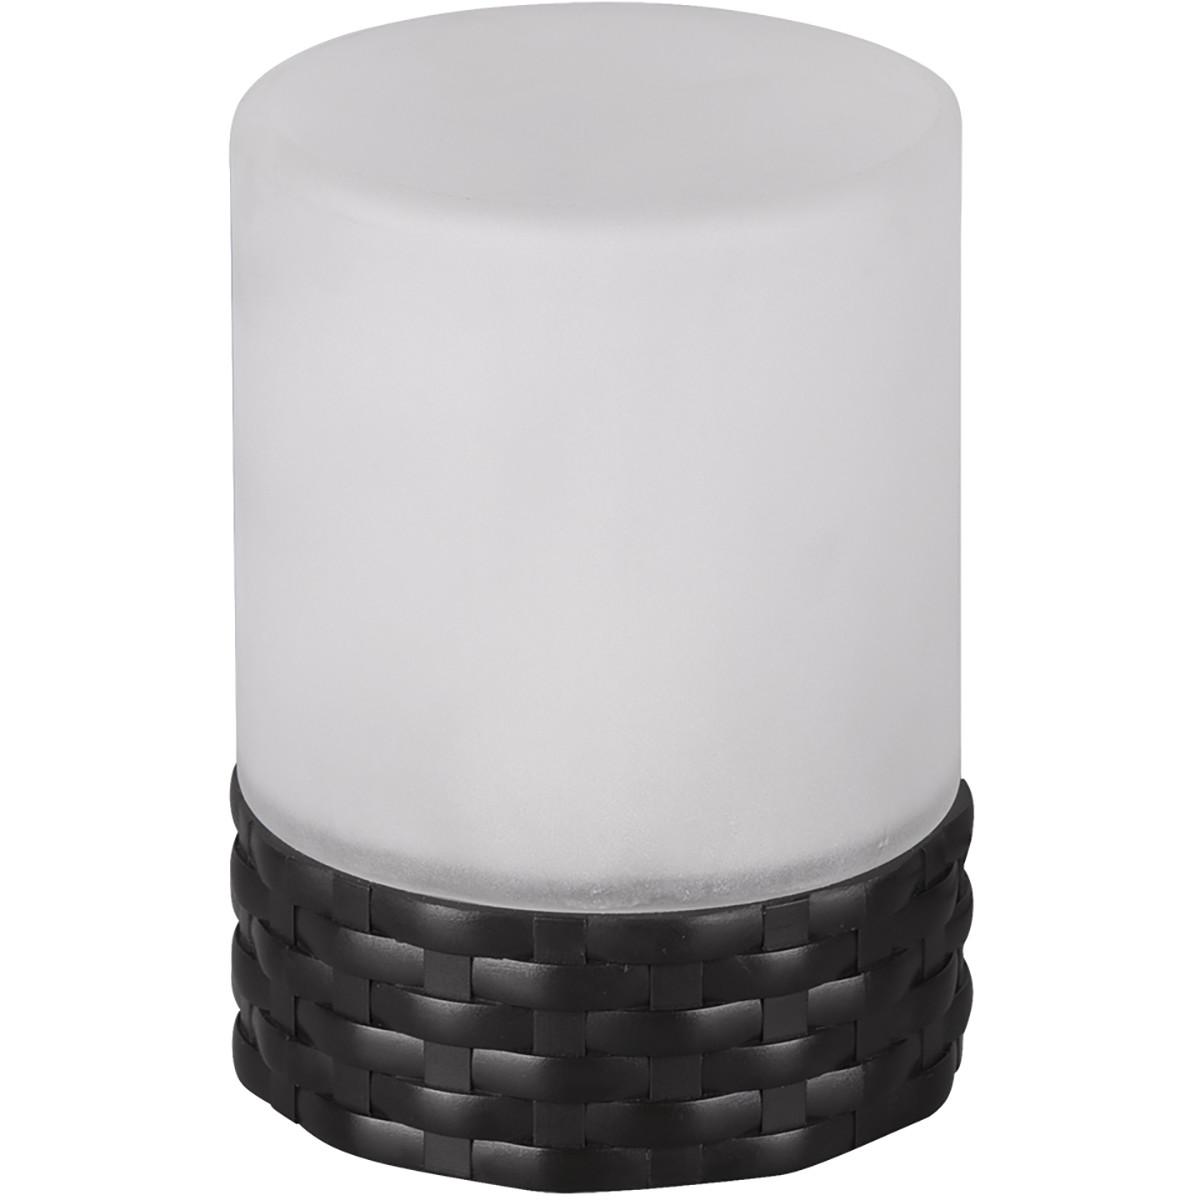 LED Tafellamp - Trion Parila - Zonne-energie - Spatwaterdicht - Mat Zwart - Kunststof